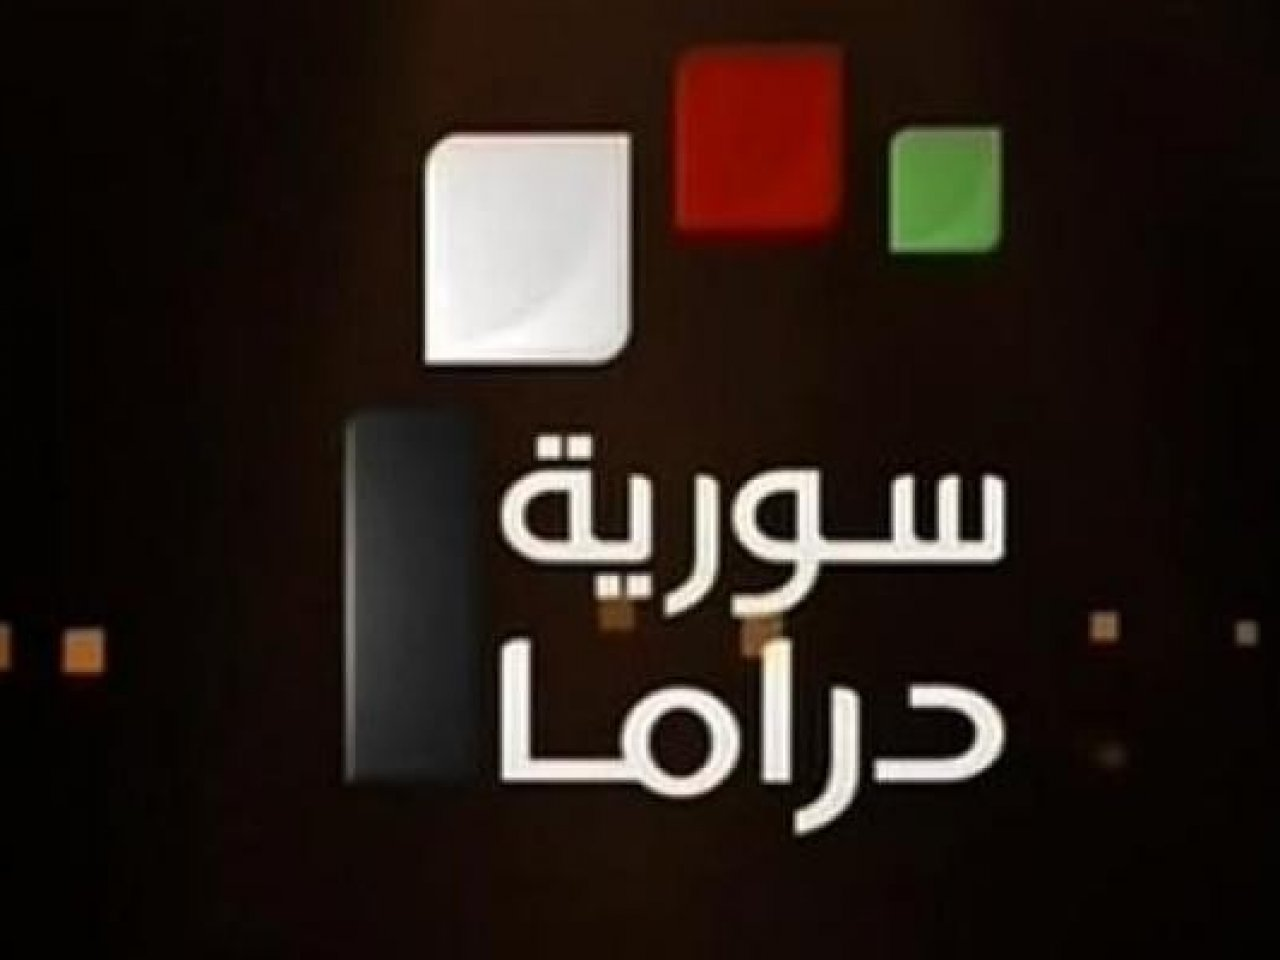 صورة ترددات سوريا دراما , اتفرج علي احلي مسلسلات و افلام علي سوريا دارما